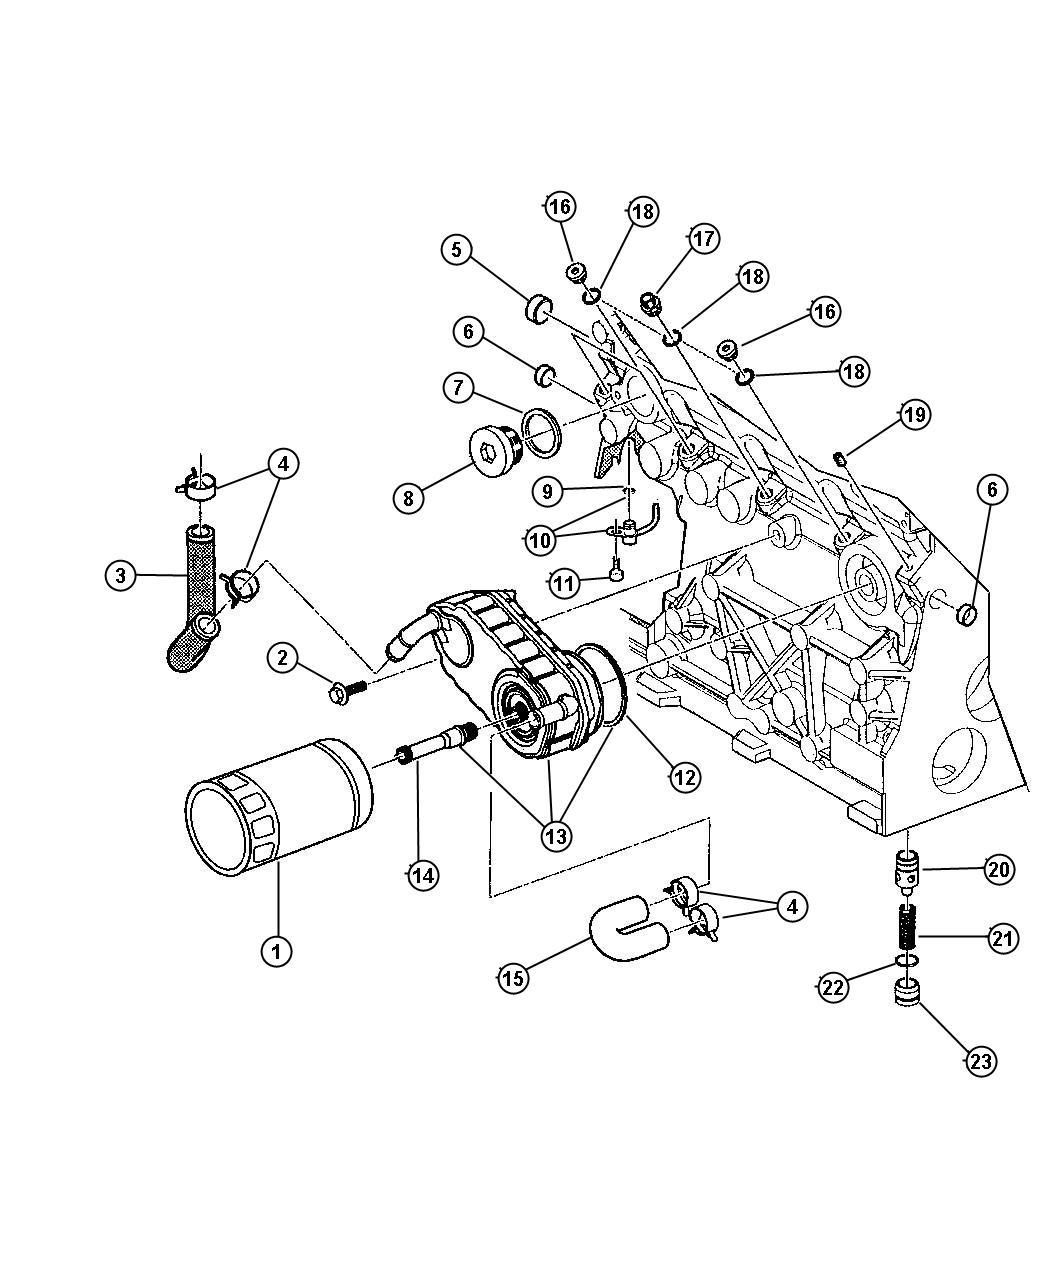 Dodge Dart Valve Oil Pressure Relief